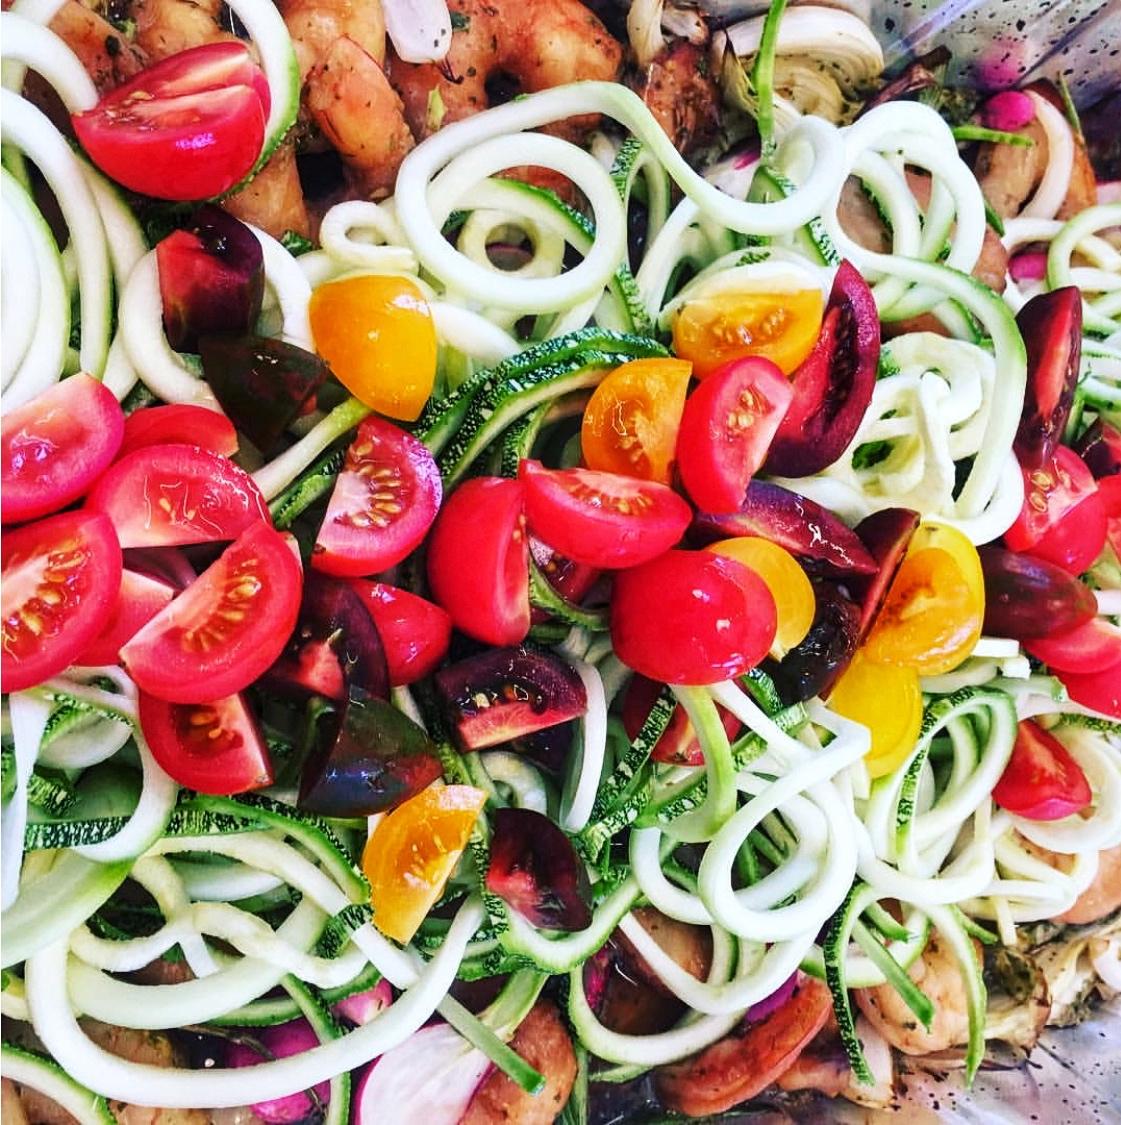 Chappy_kitchen_shrimp_salad.jpeg